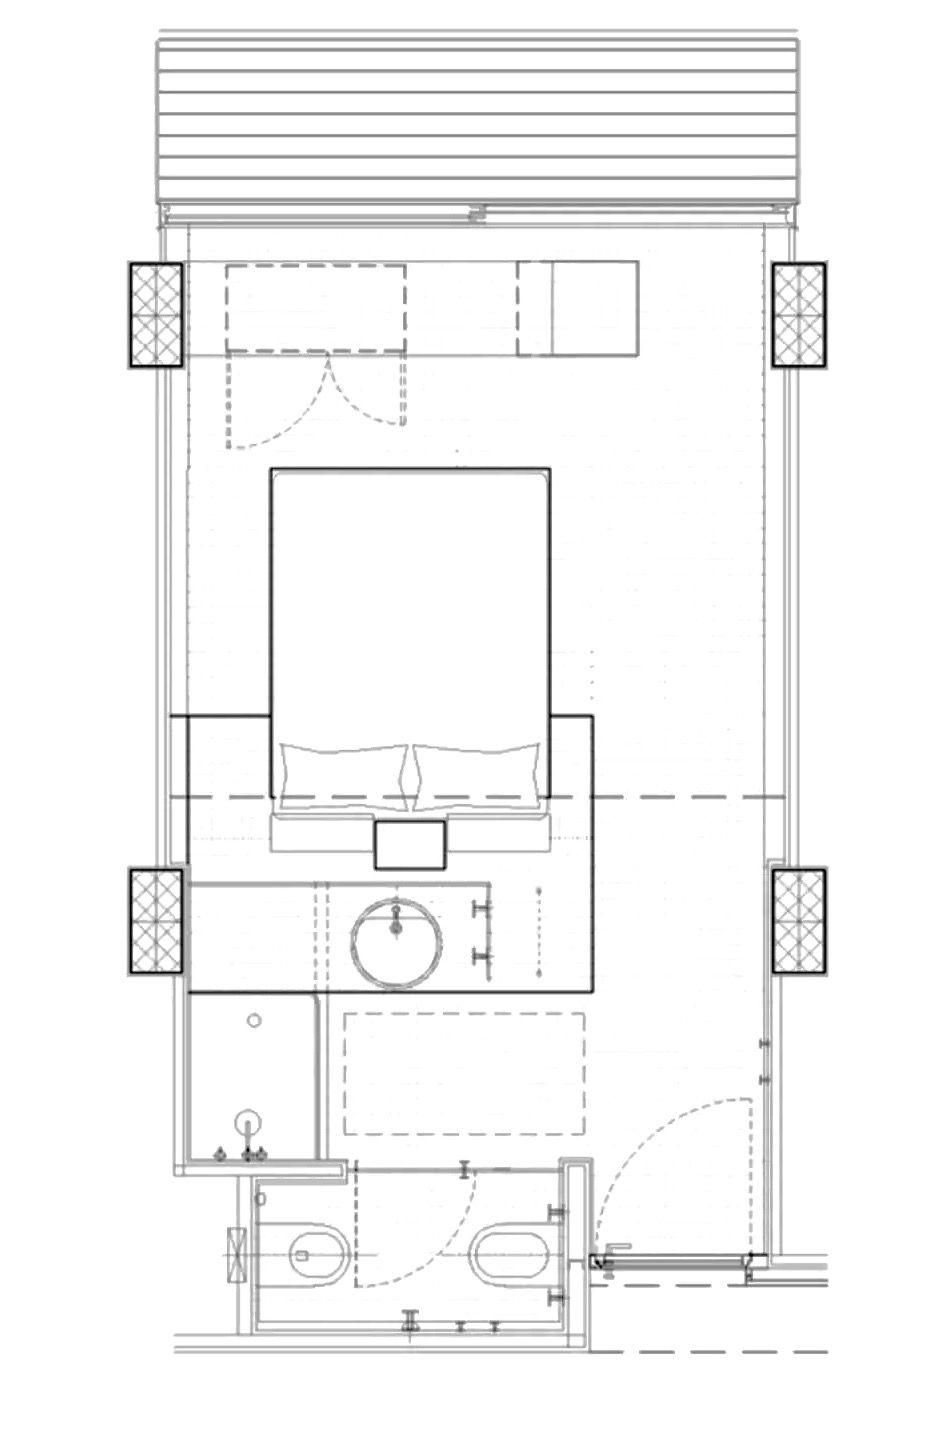 Hotel Room Plan: Radisson Blu Es. Hotel, Rome